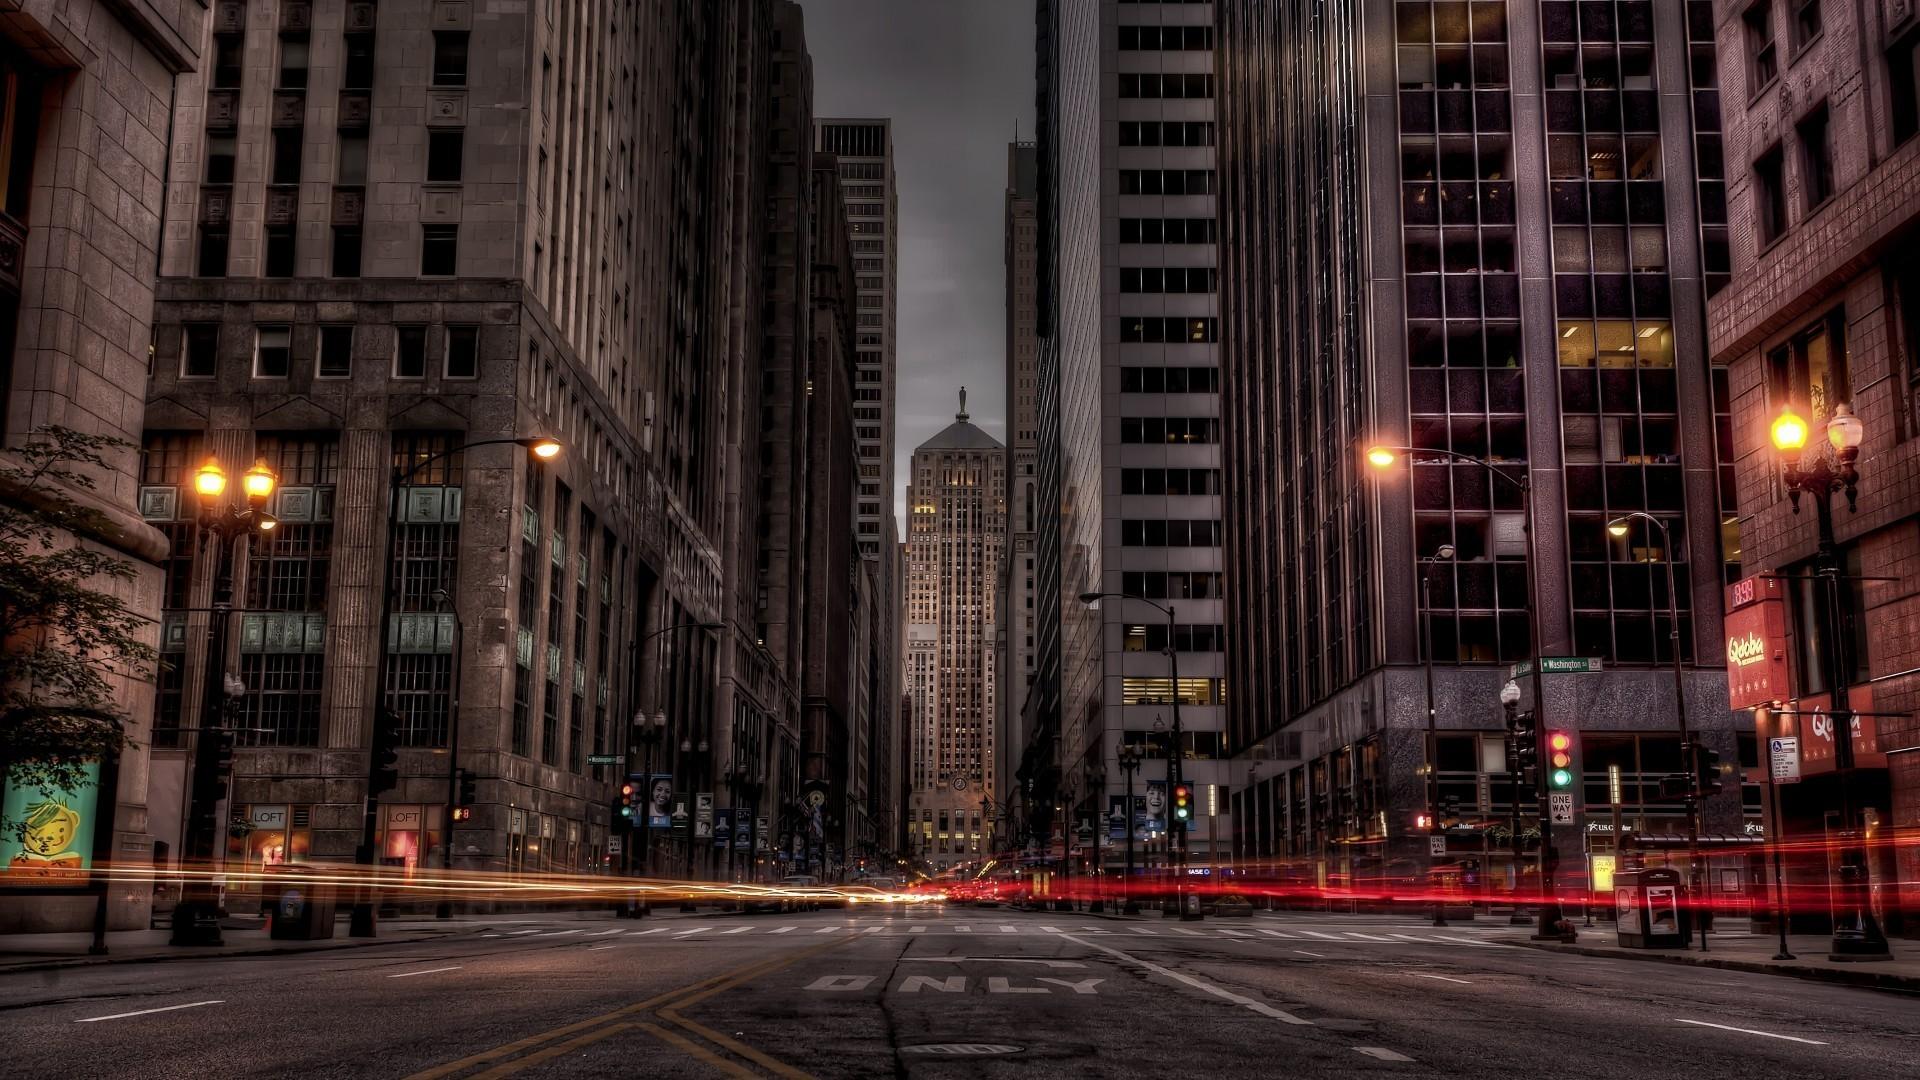 Wallpaper : city, street, cityscape, night, building, road